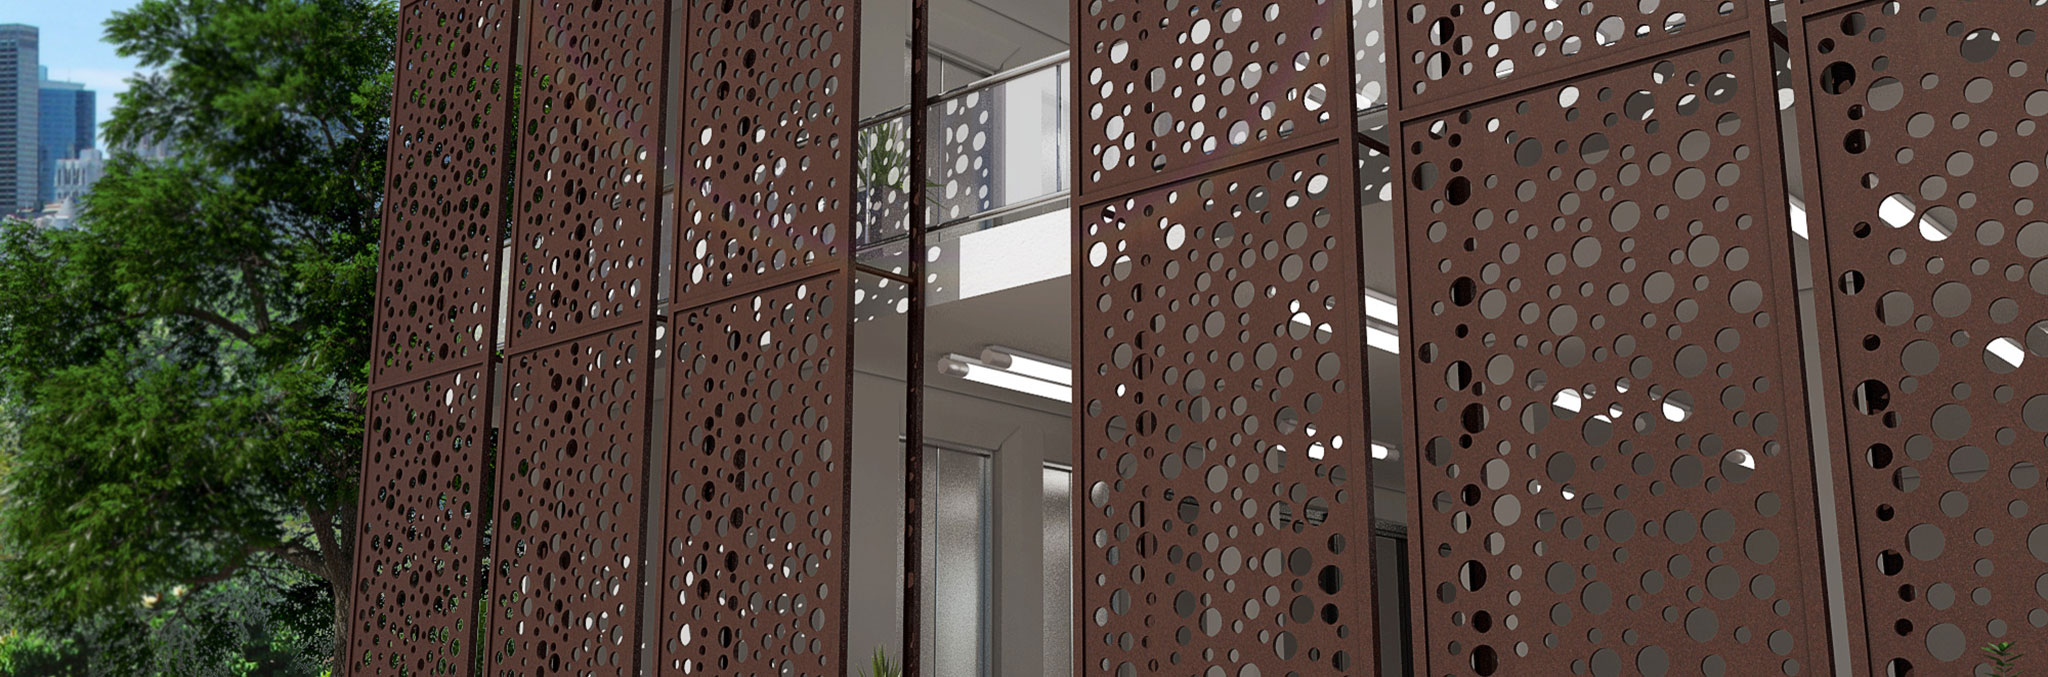 Laser Cut Metal Exterior Architectural Metal Installation